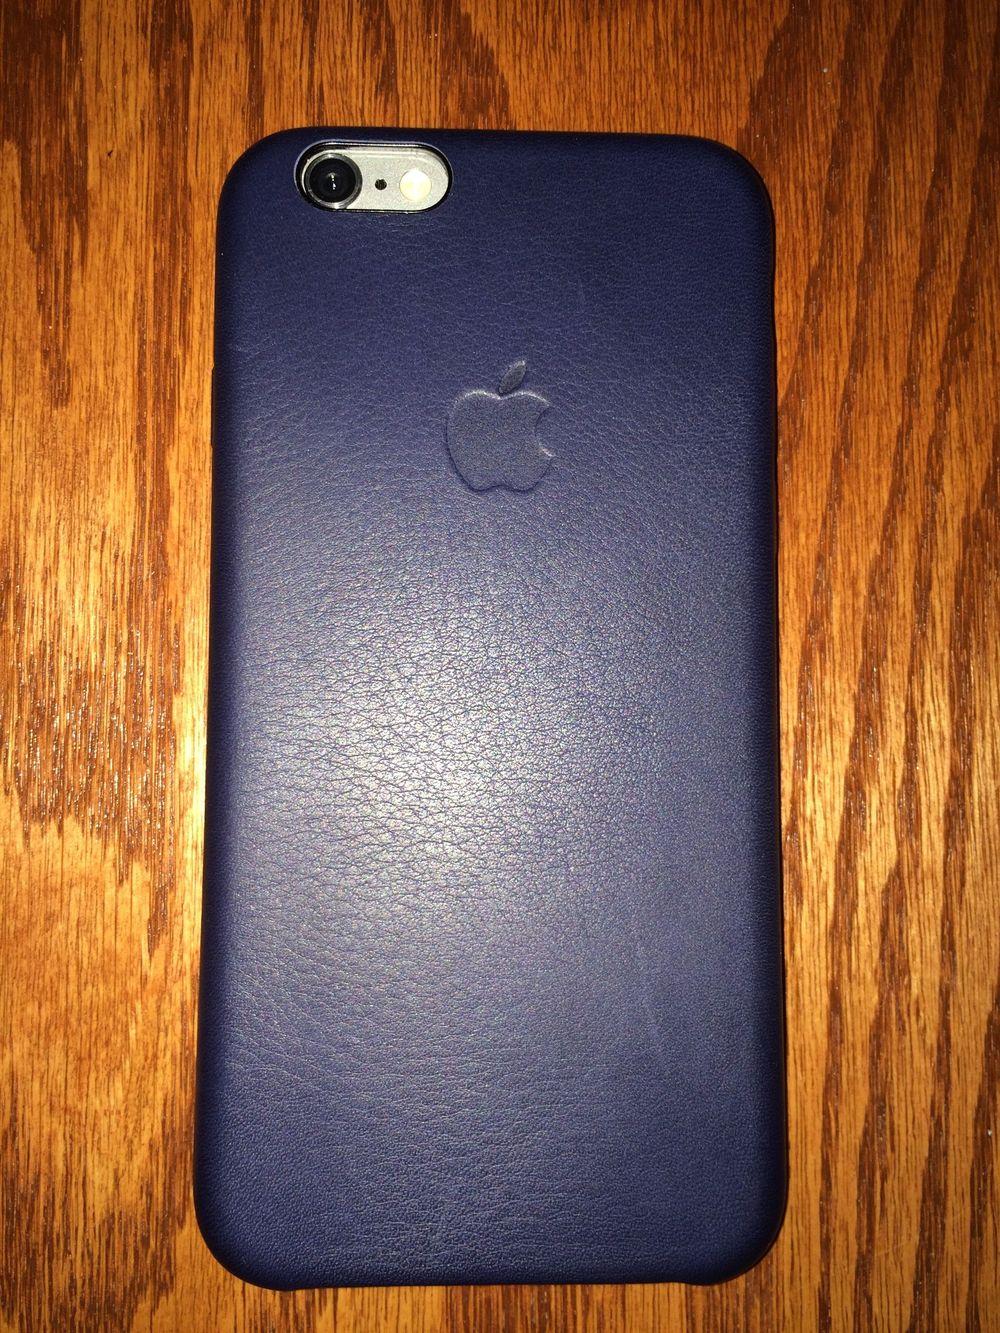 2014-10-01 - iphone 6 case4.jpg